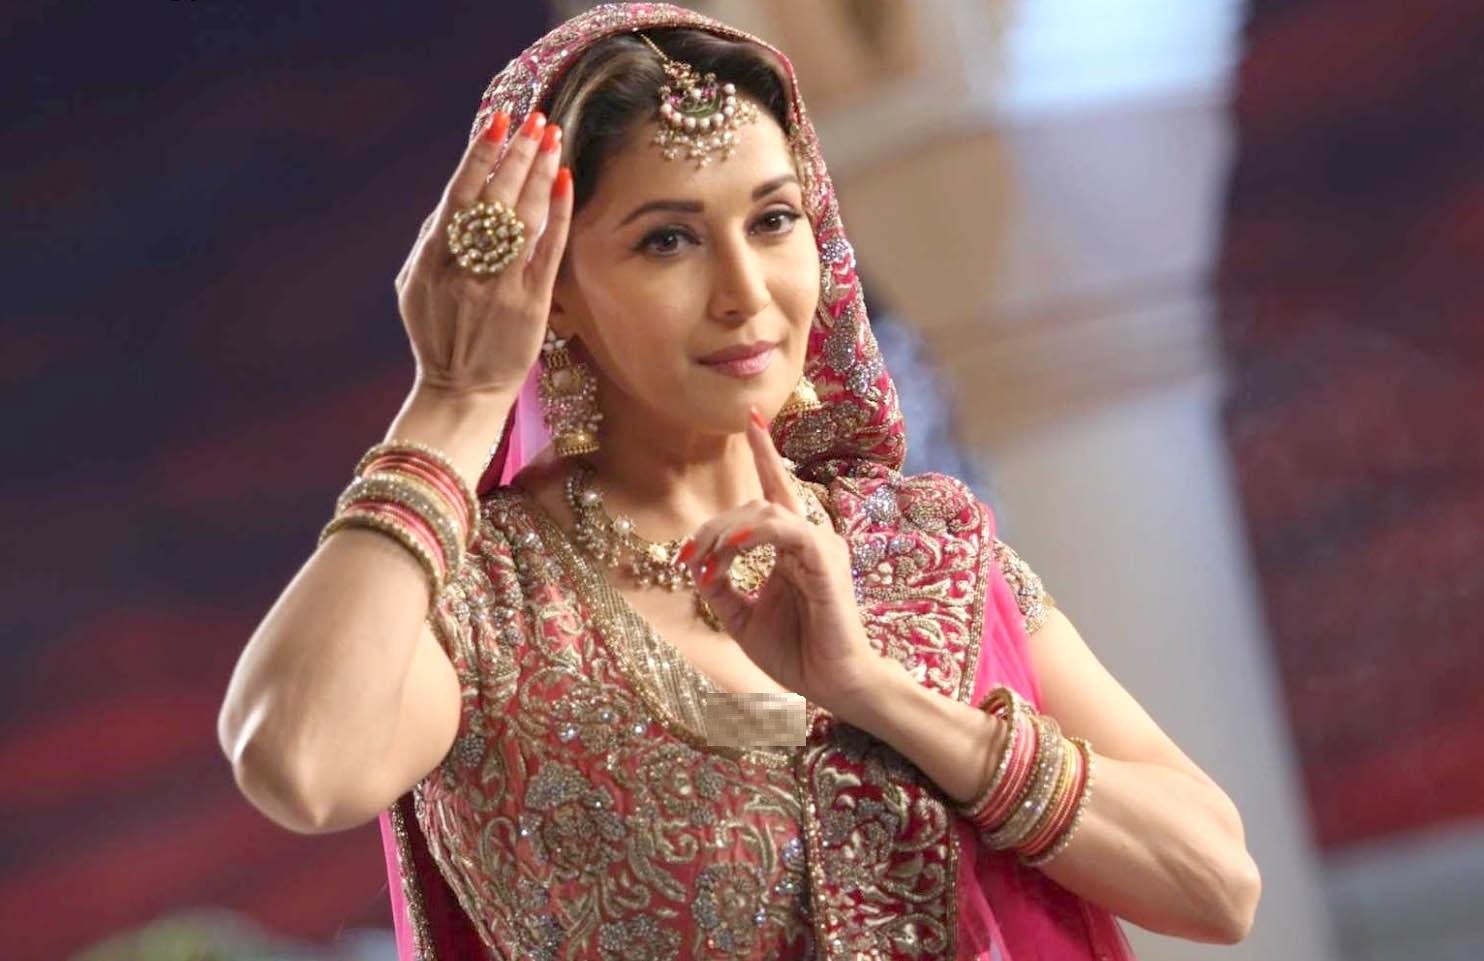 Madhuri Dixit in Pink Bridal Dress